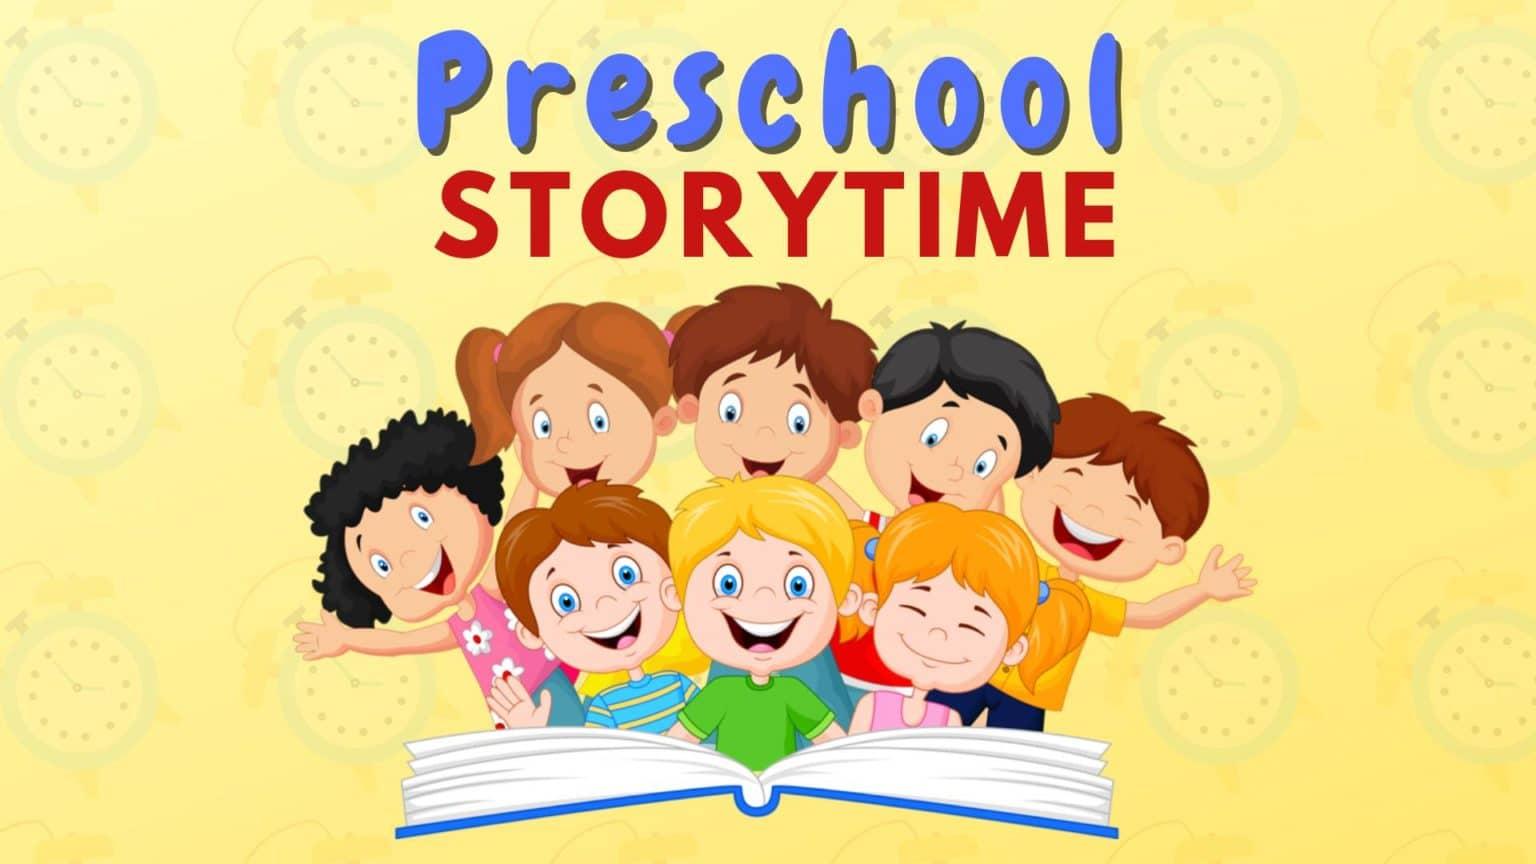 4/9/20 Preschool Storytime